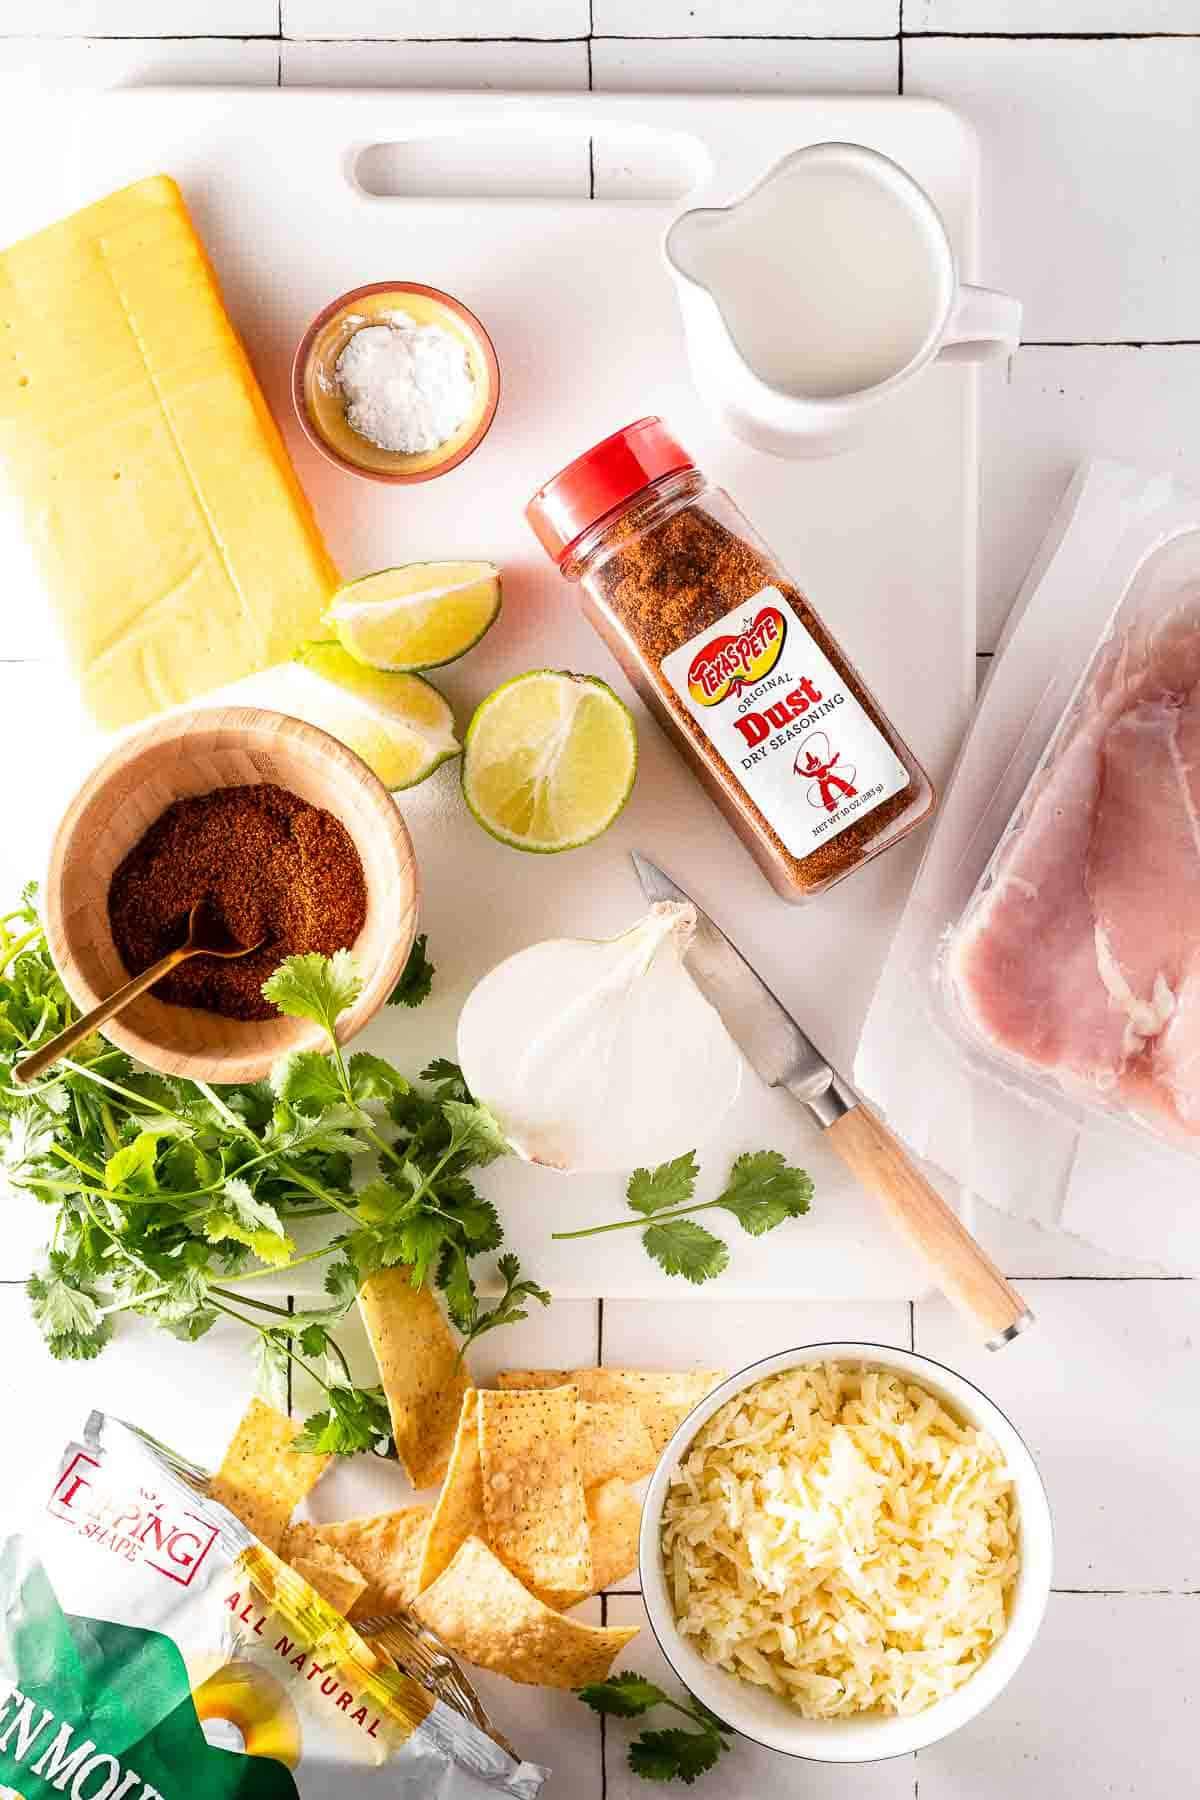 recipe ingredients on cutting board